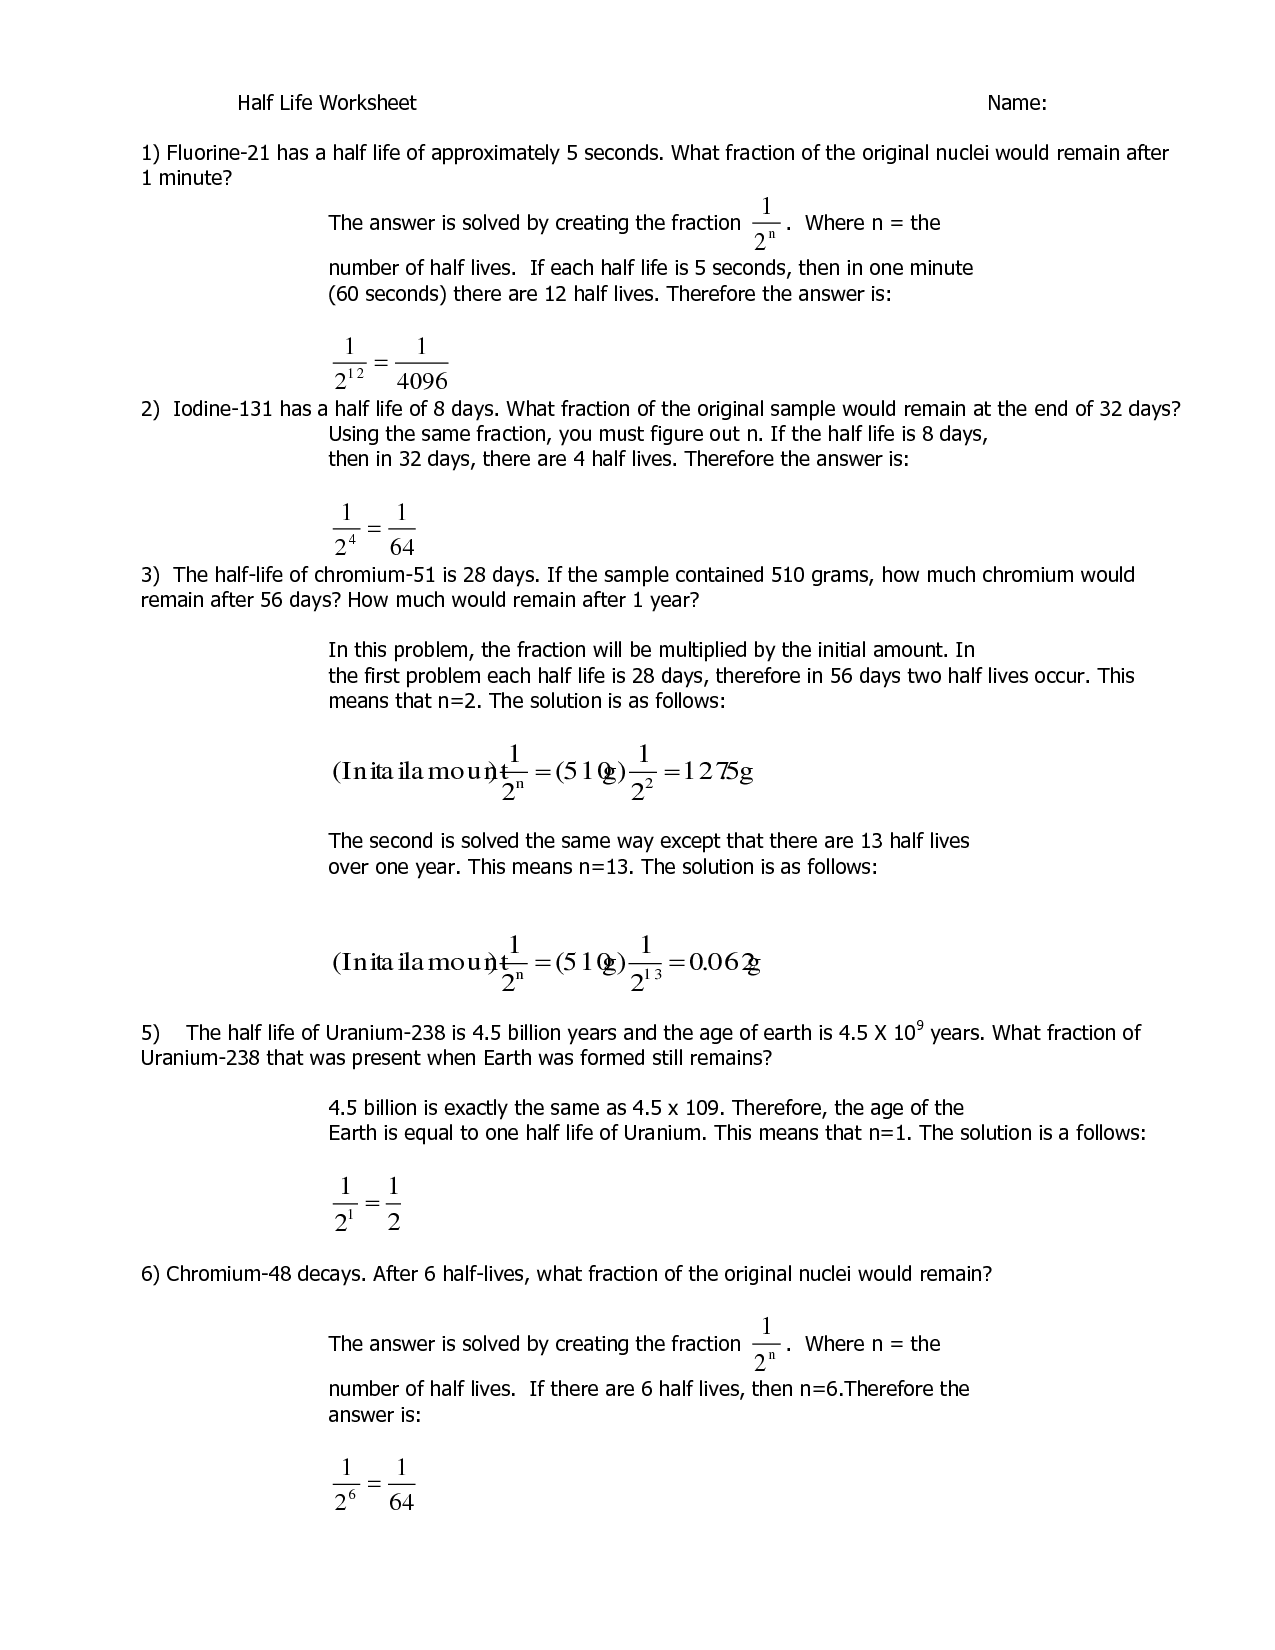 Half Life Problems Worksheet